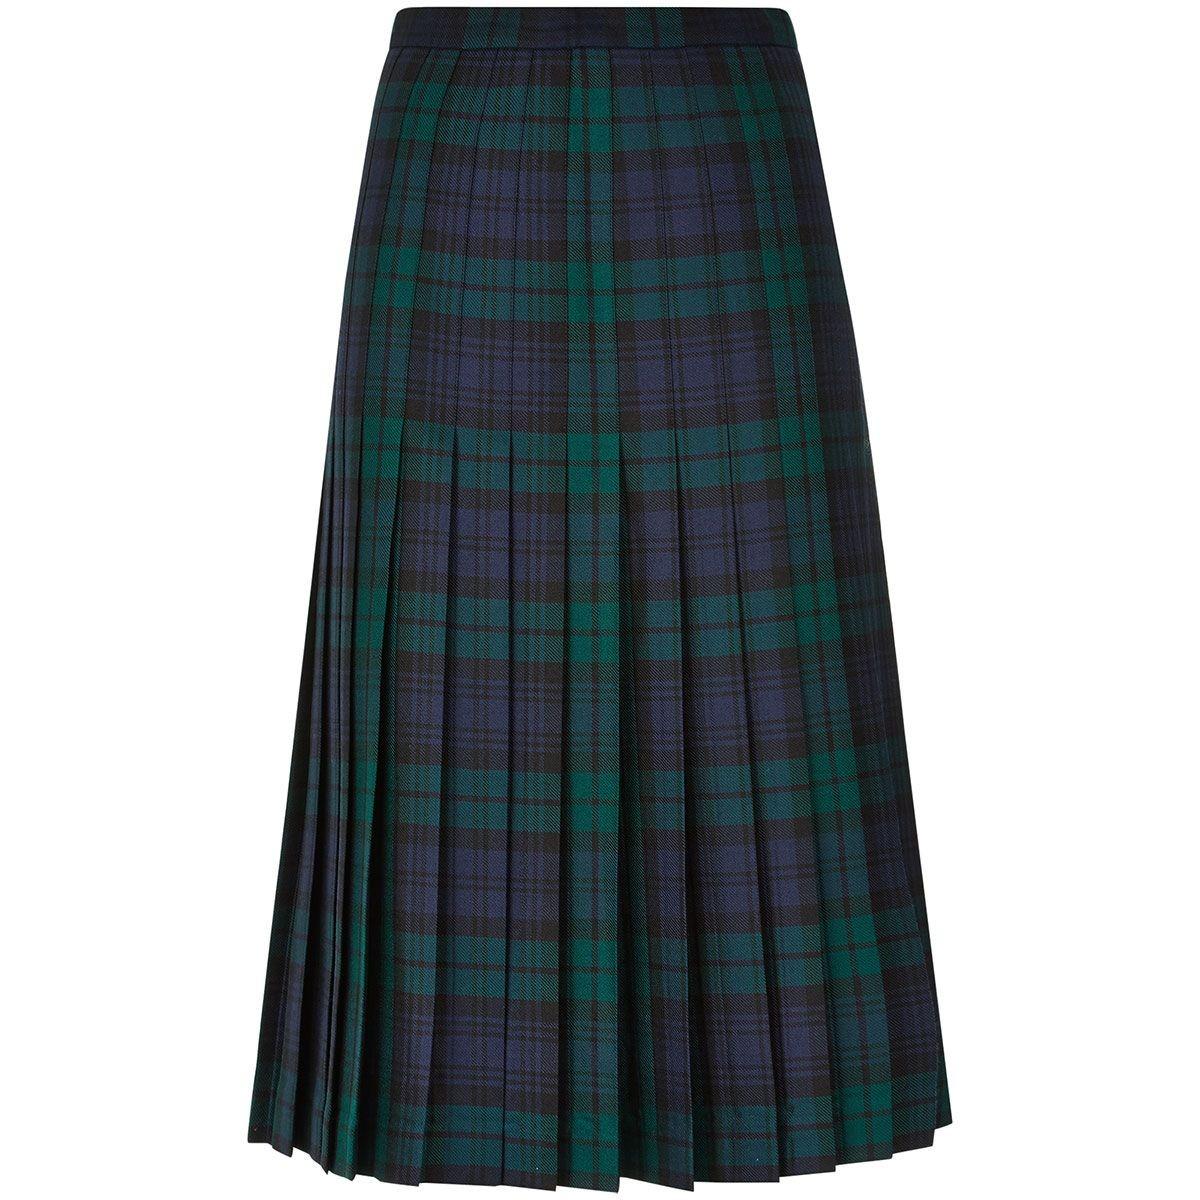 Fiona Skirt - Ladies Tartan All-round Pleated Skirt - Front